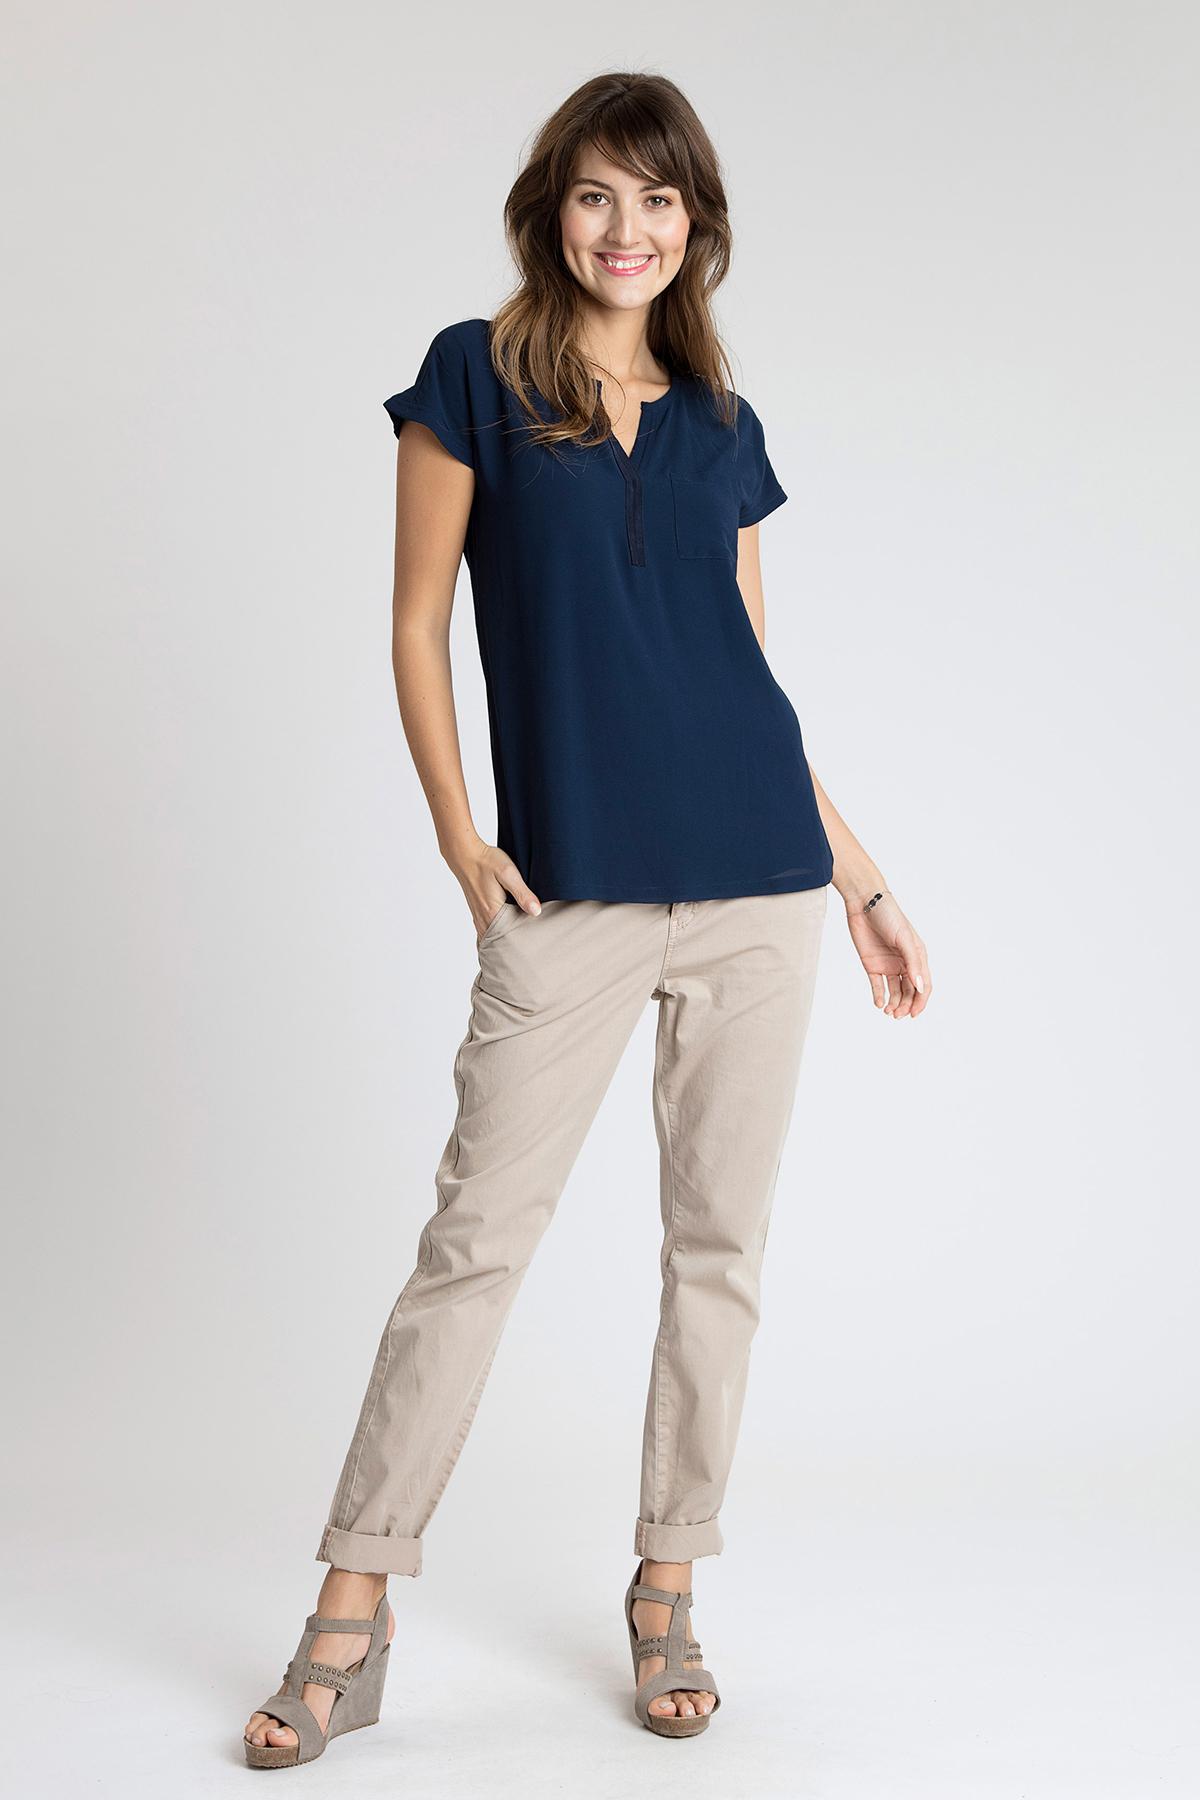 Marineblau Kurzarm-Bluse von Fransa – Shoppen Sie Marineblau Kurzarm-Bluse ab Gr. XS-XXL hier